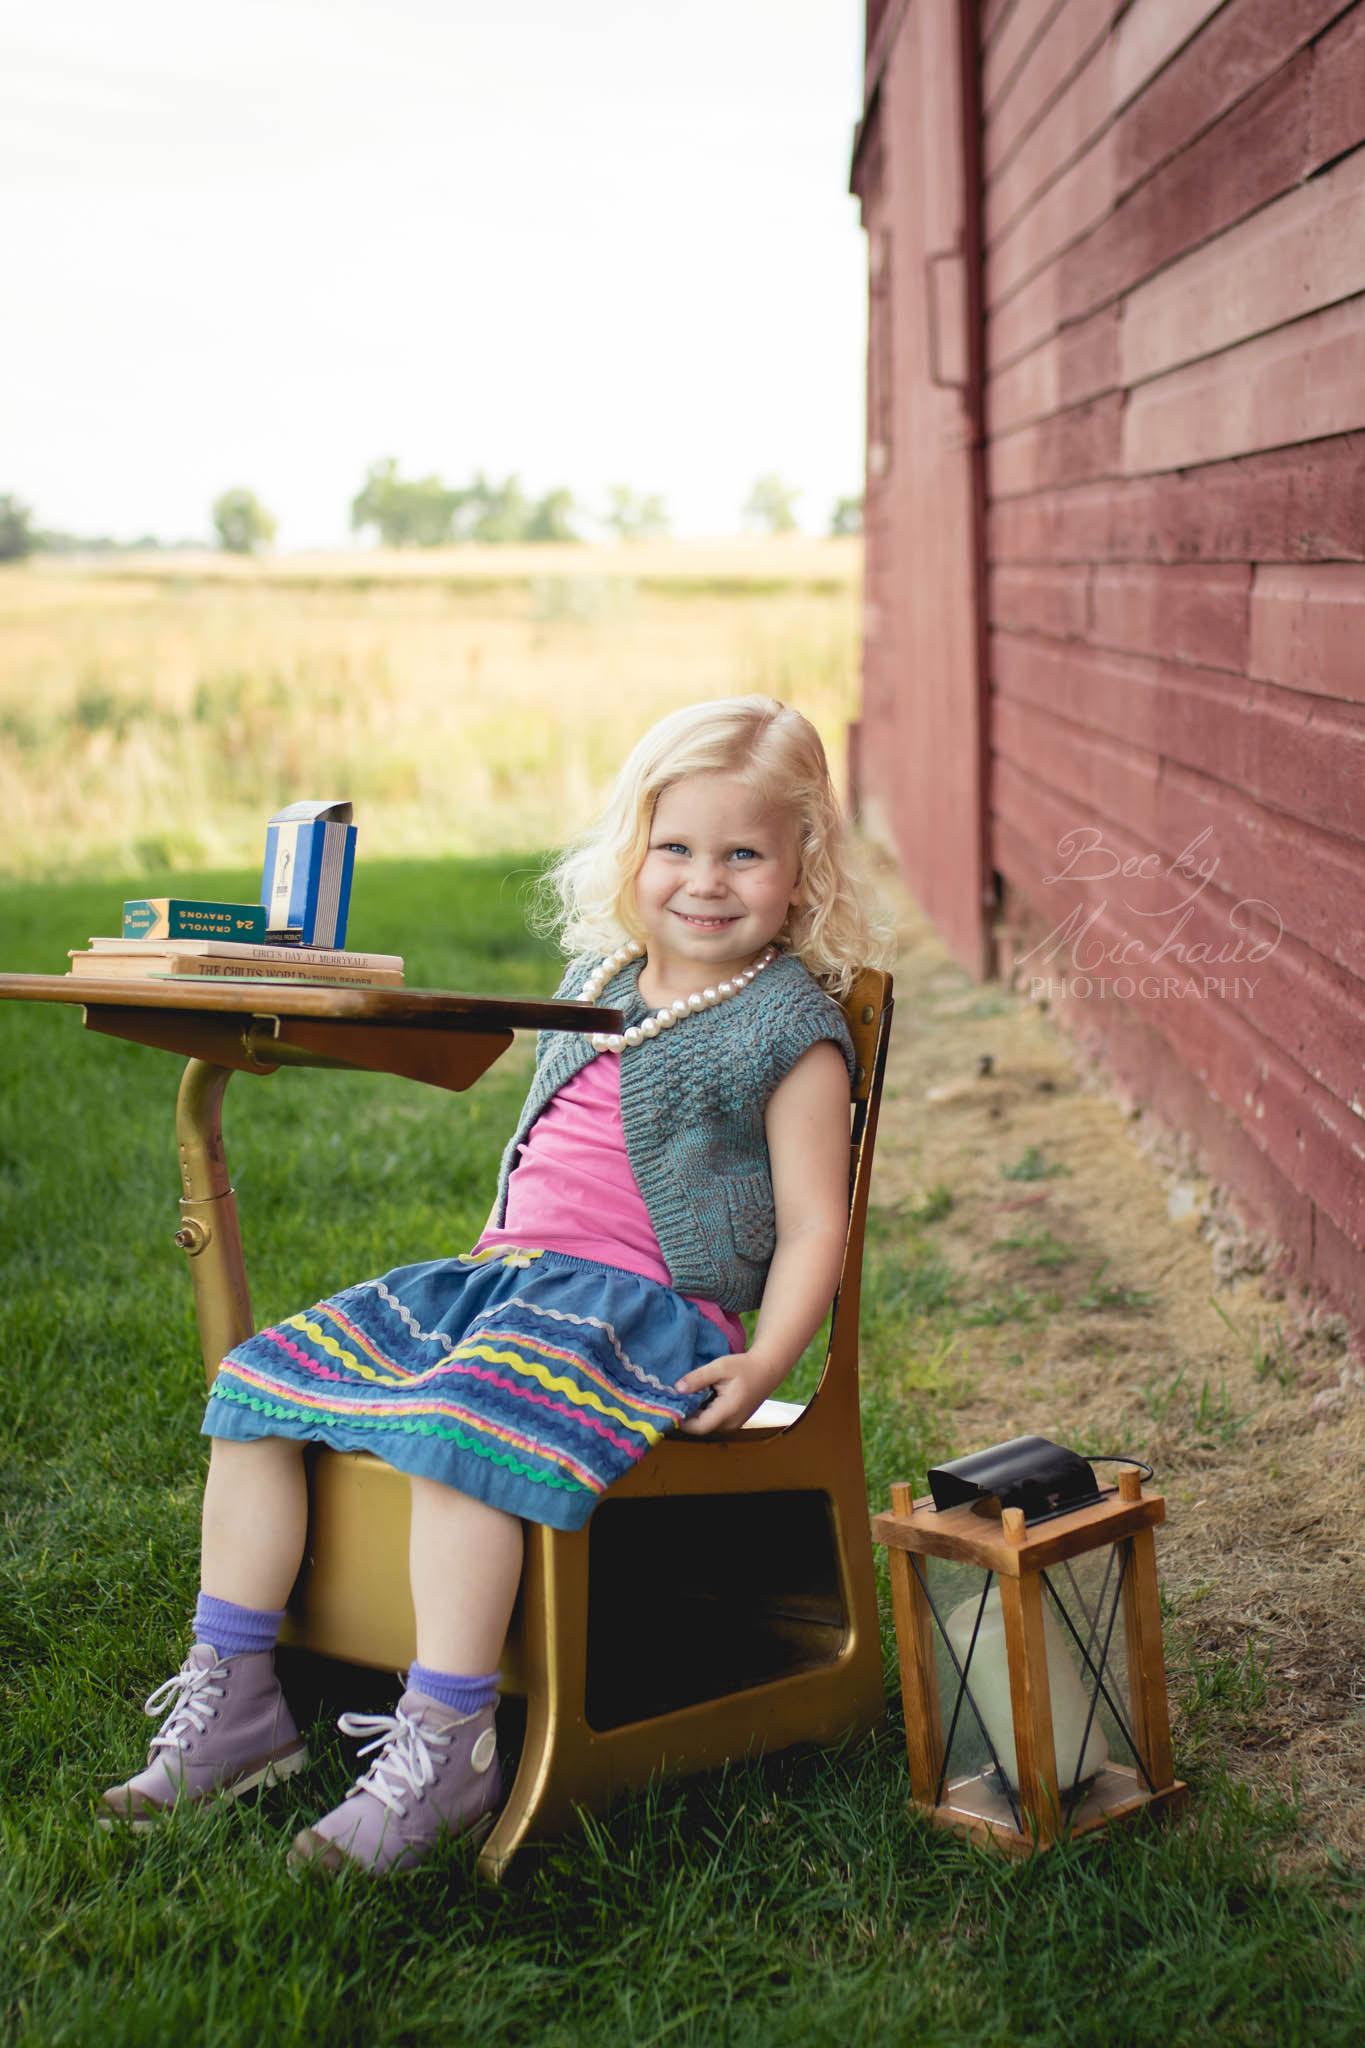 Fort Collins back to school photo using a vintage desk